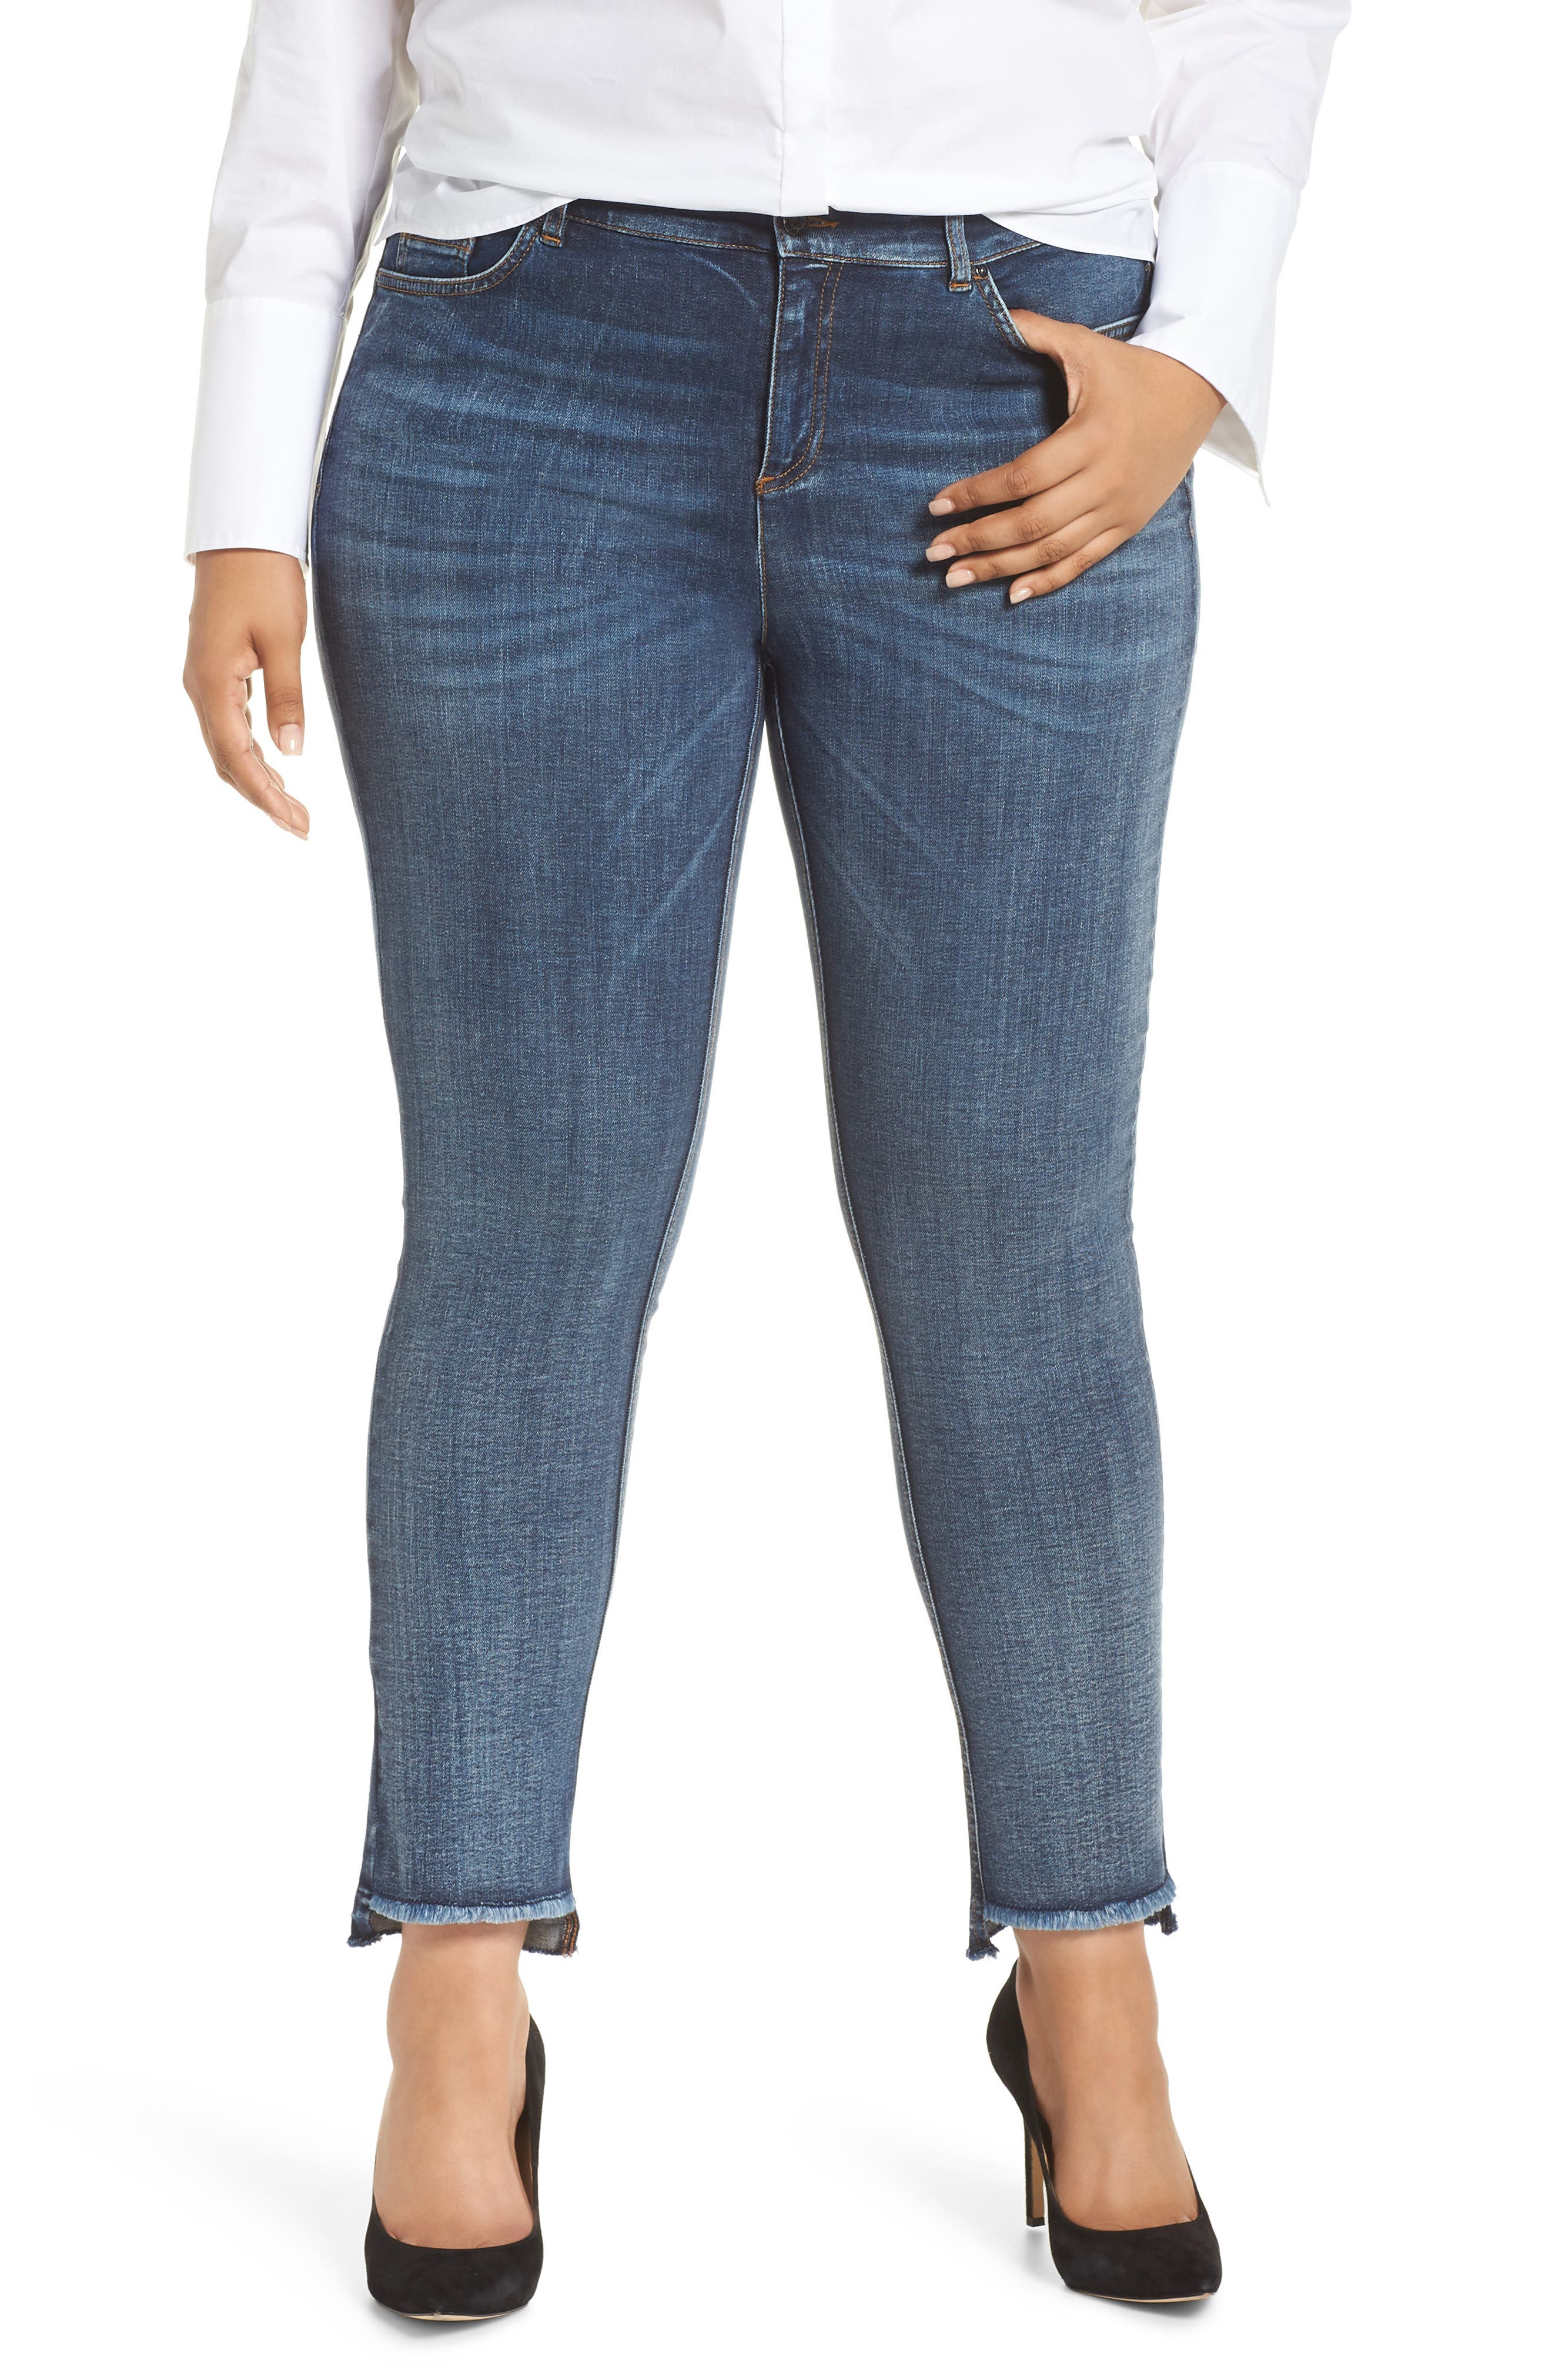 ASHLEY GRAHAM X MARINA RINALDI I Idruro High Rise Slim Leg Raw Hem Jeans in Sky Blue 2